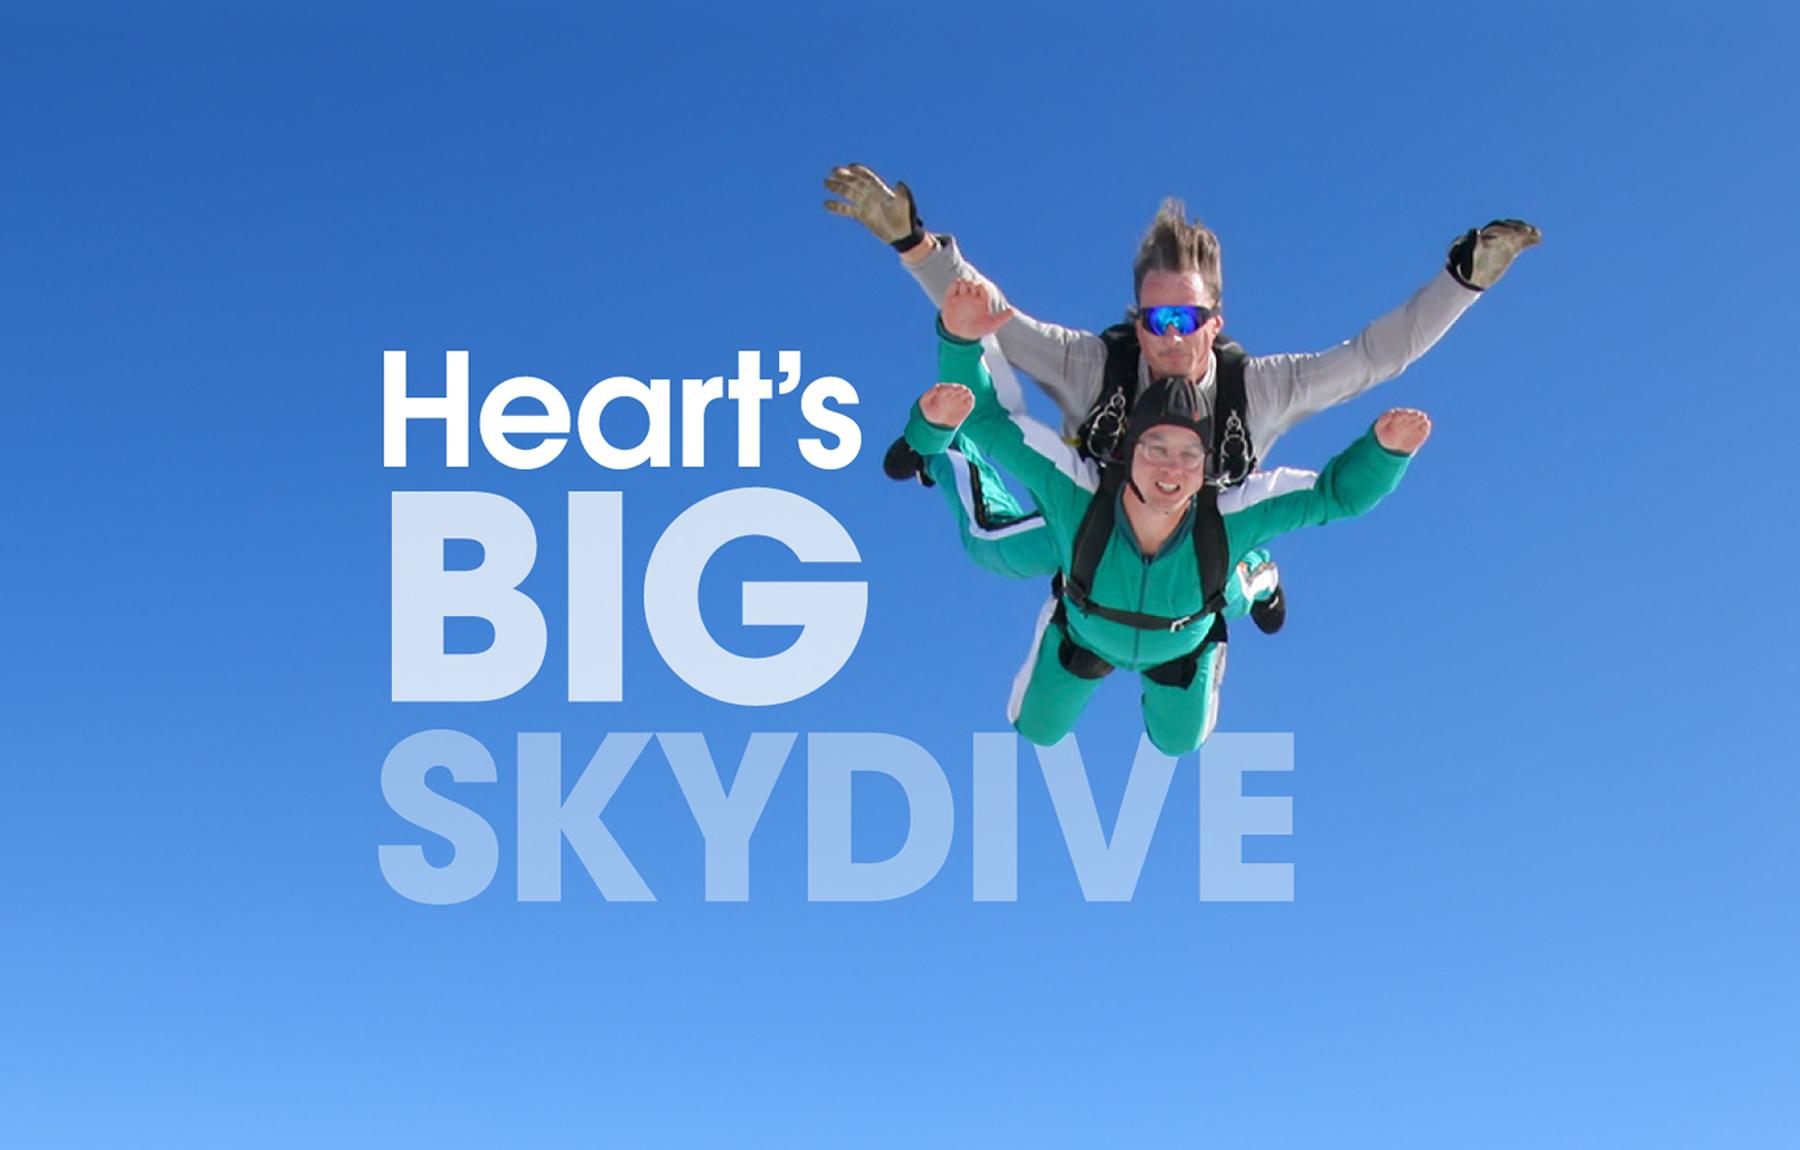 Take on Heart's Big Skydive